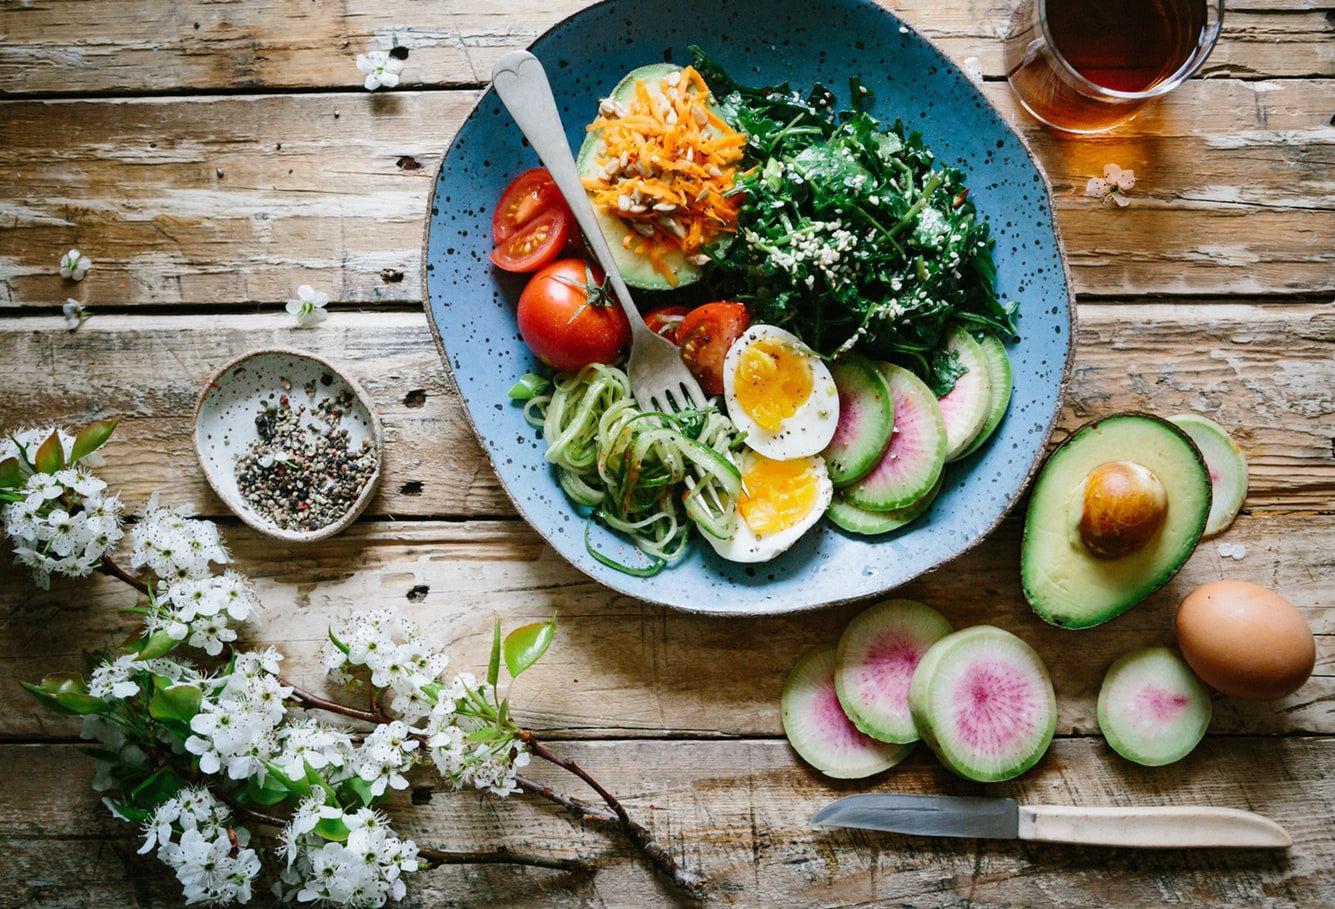 Initial Nutrition Consultation